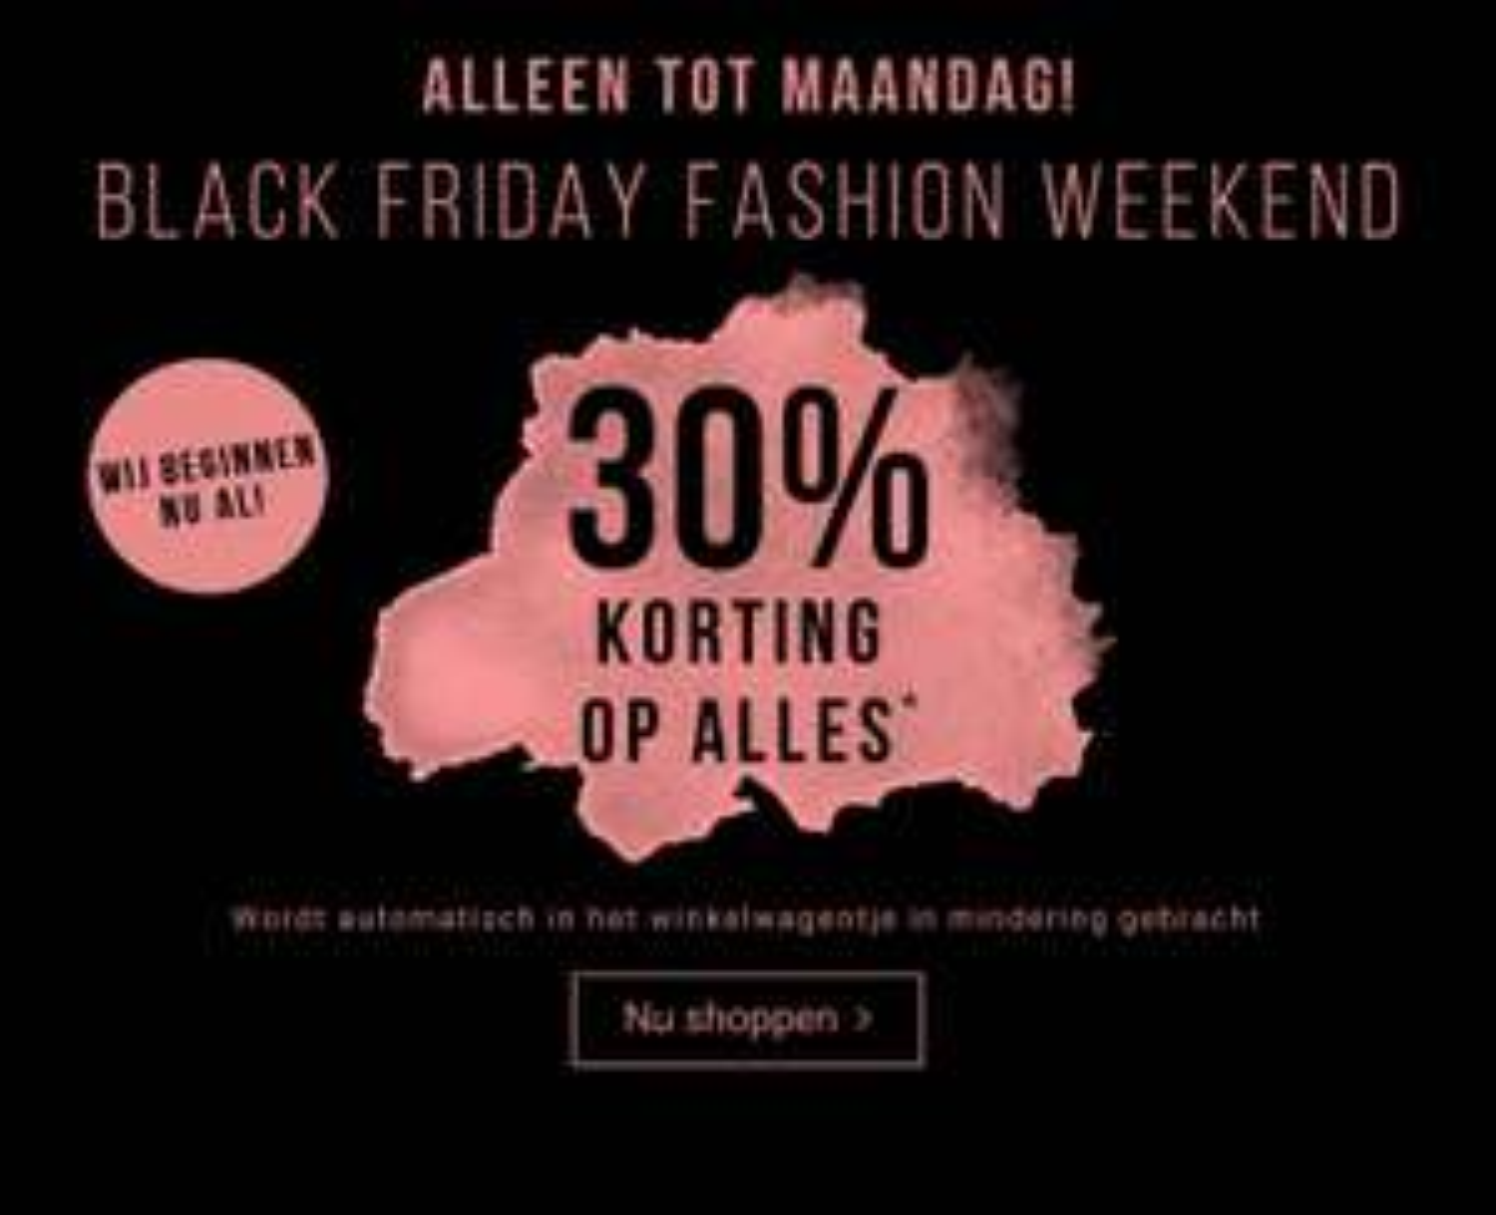 [Black Friday] 30% korting op alles + gratis verzending @ Tom Tailor